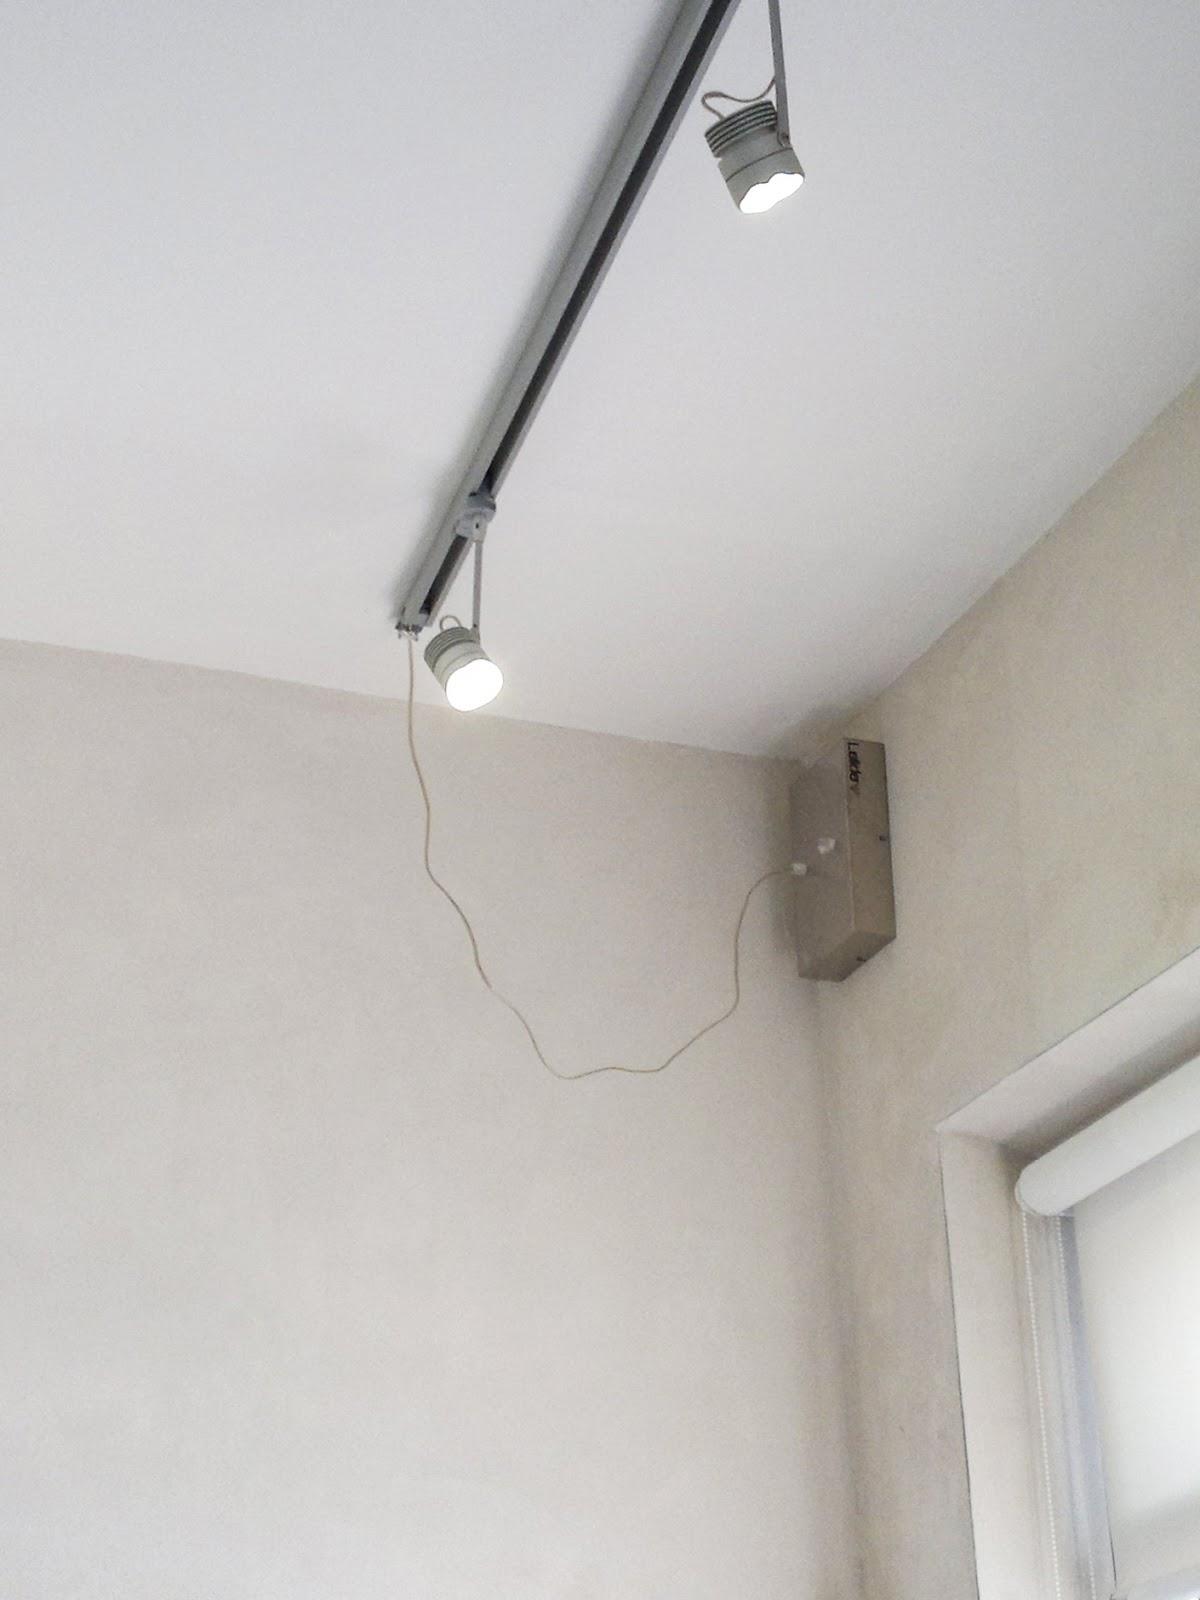 Luci per scale interne - Illuminazione scale interne led ...